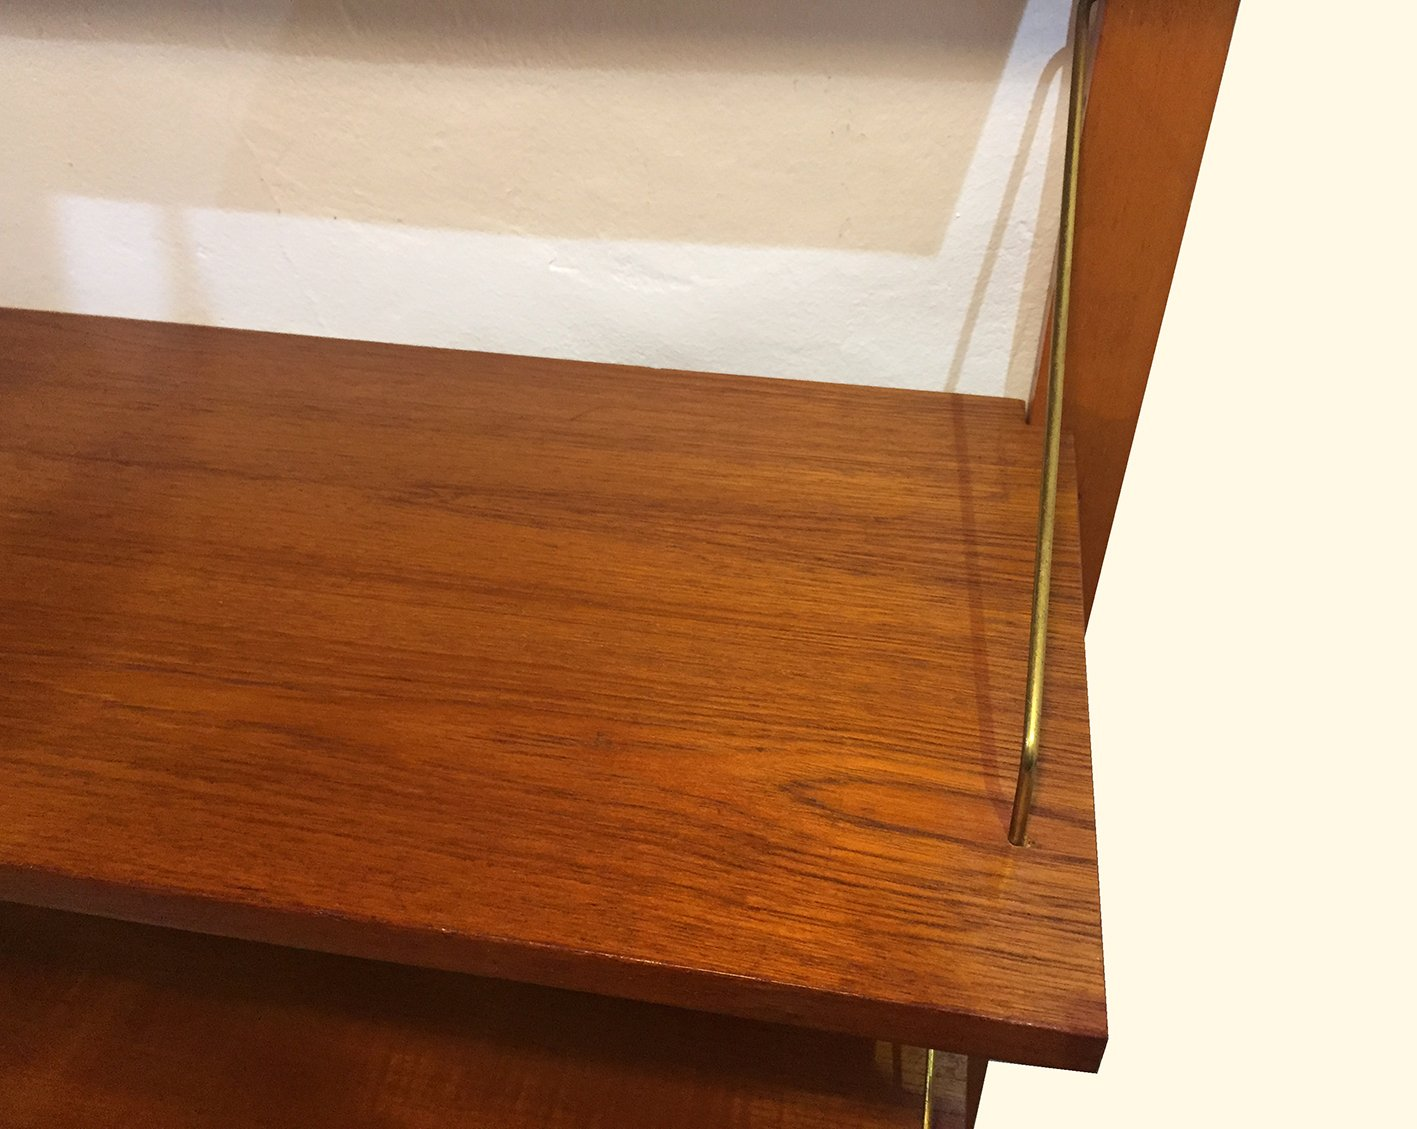 2 teiliges d nisches royal system wand regalsystem von poul cadovius f r cado 1960er bei pamono. Black Bedroom Furniture Sets. Home Design Ideas